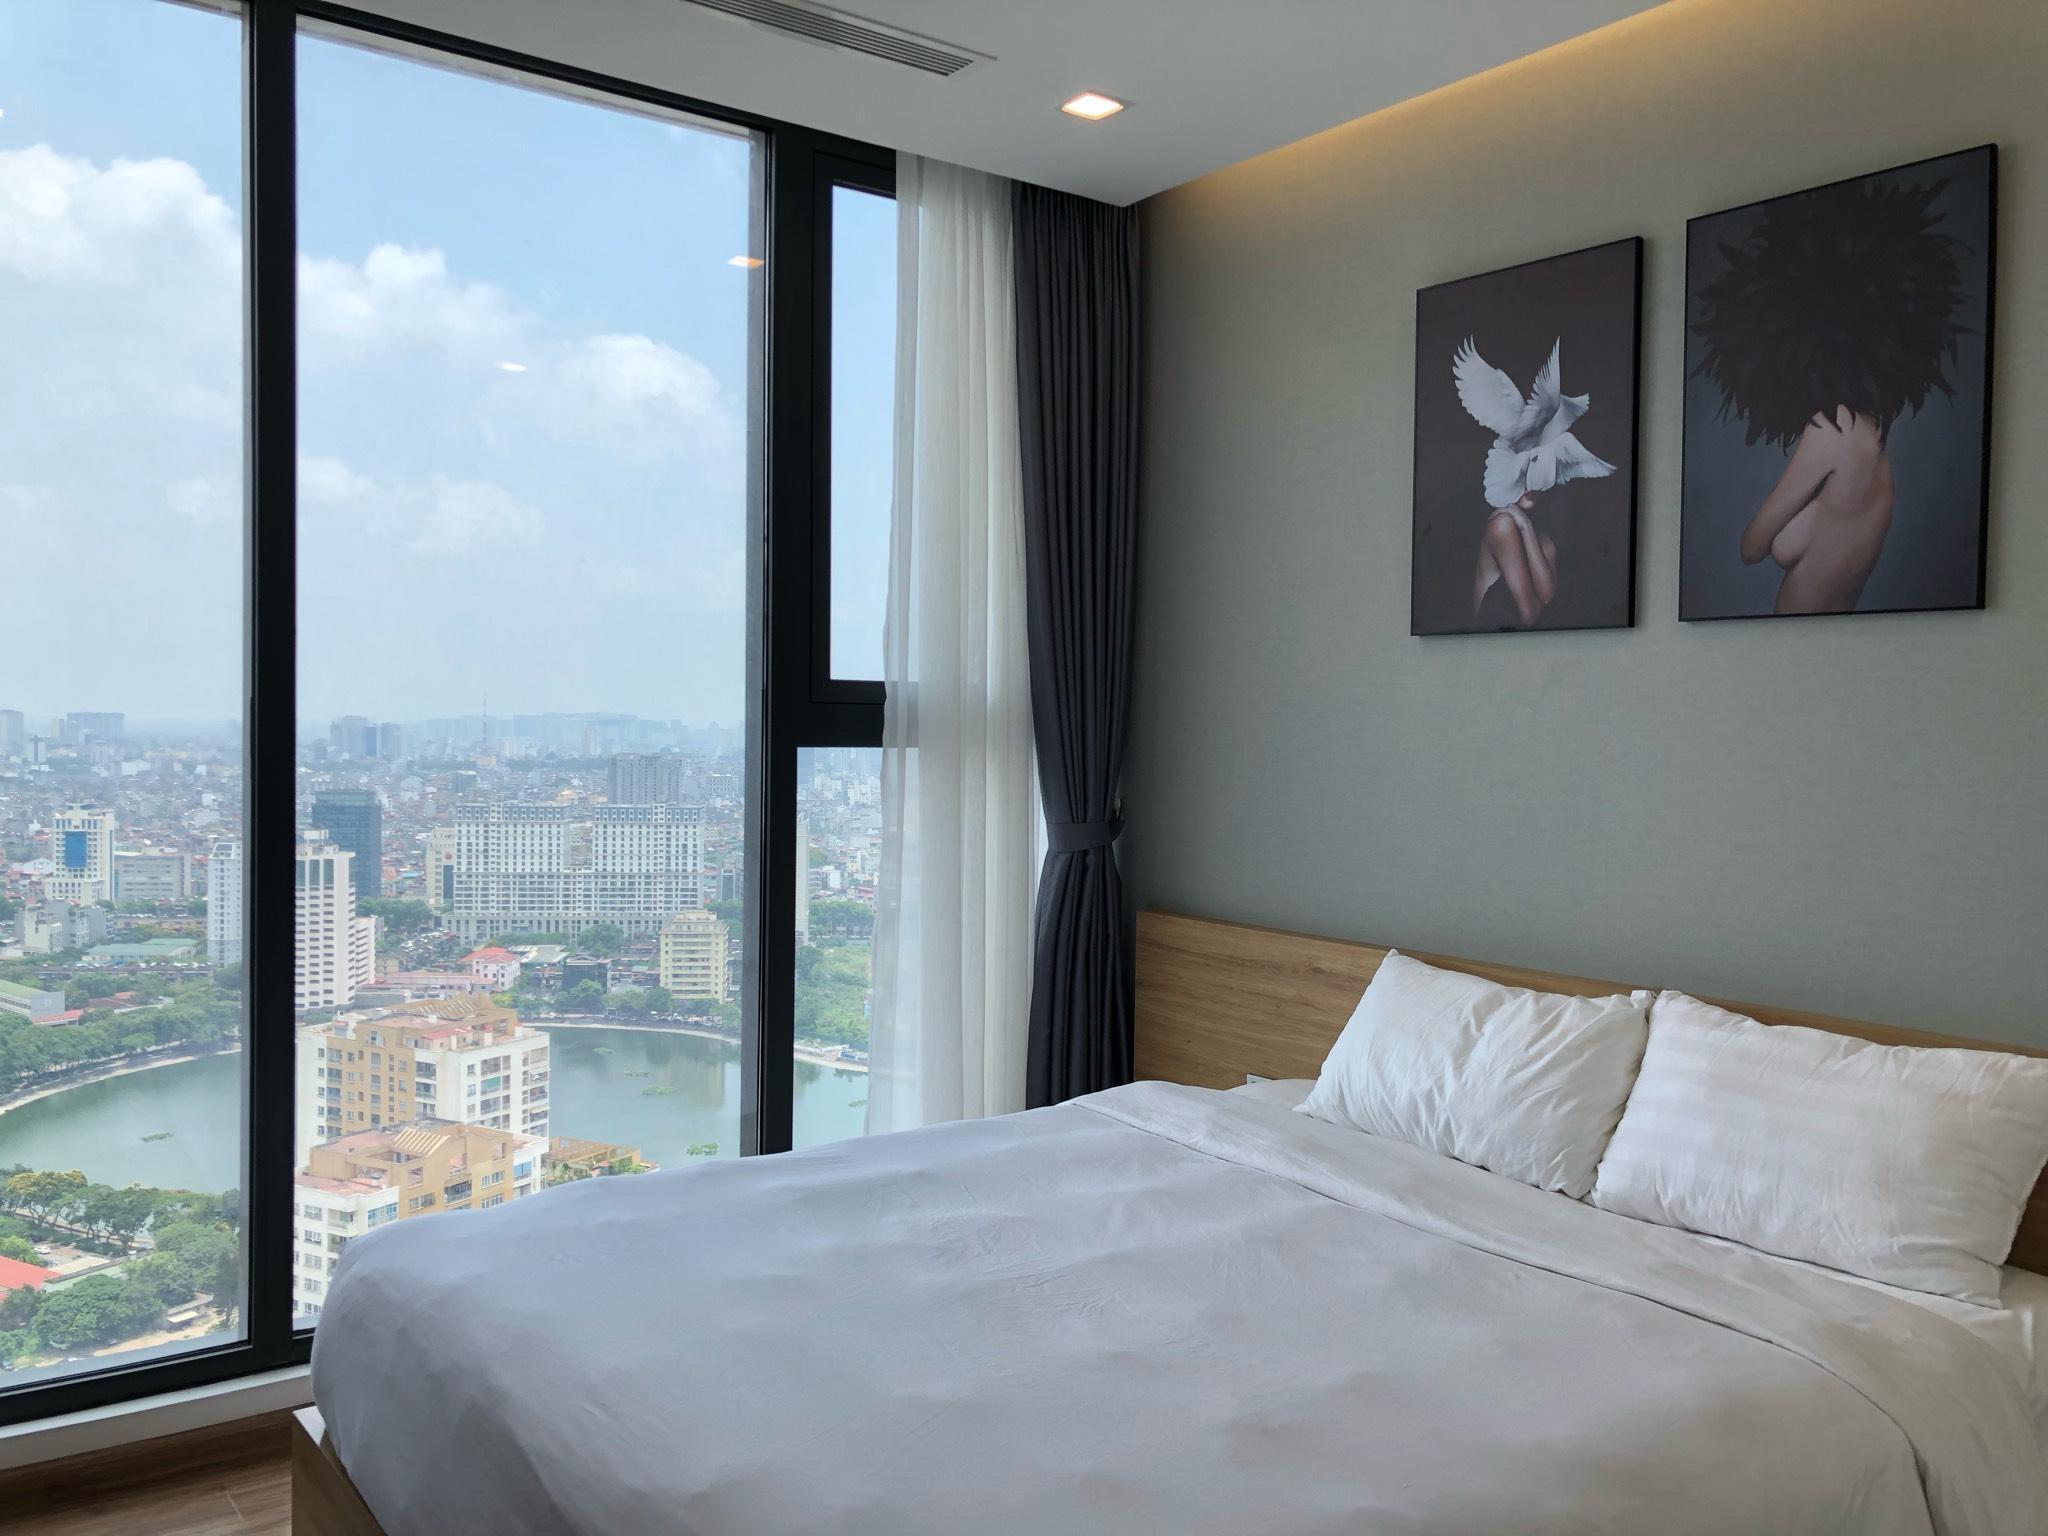 2 Bedrooms Vinhome Metropolis Near Lotte Center